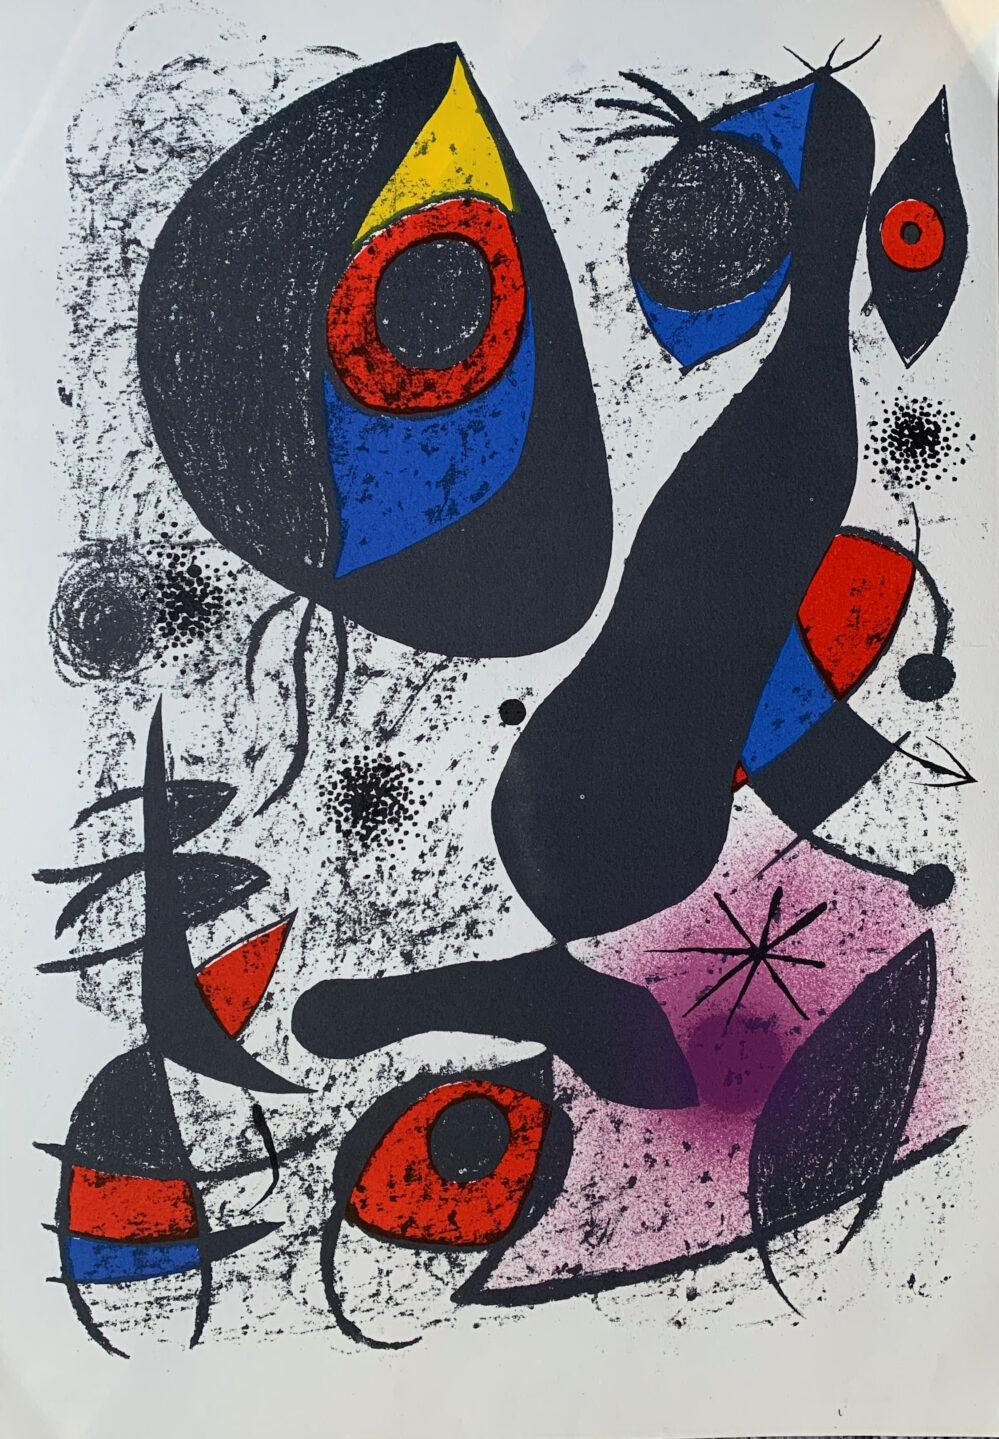 Joan Miro A La Encre I 1982 Limited Edition Lithograph